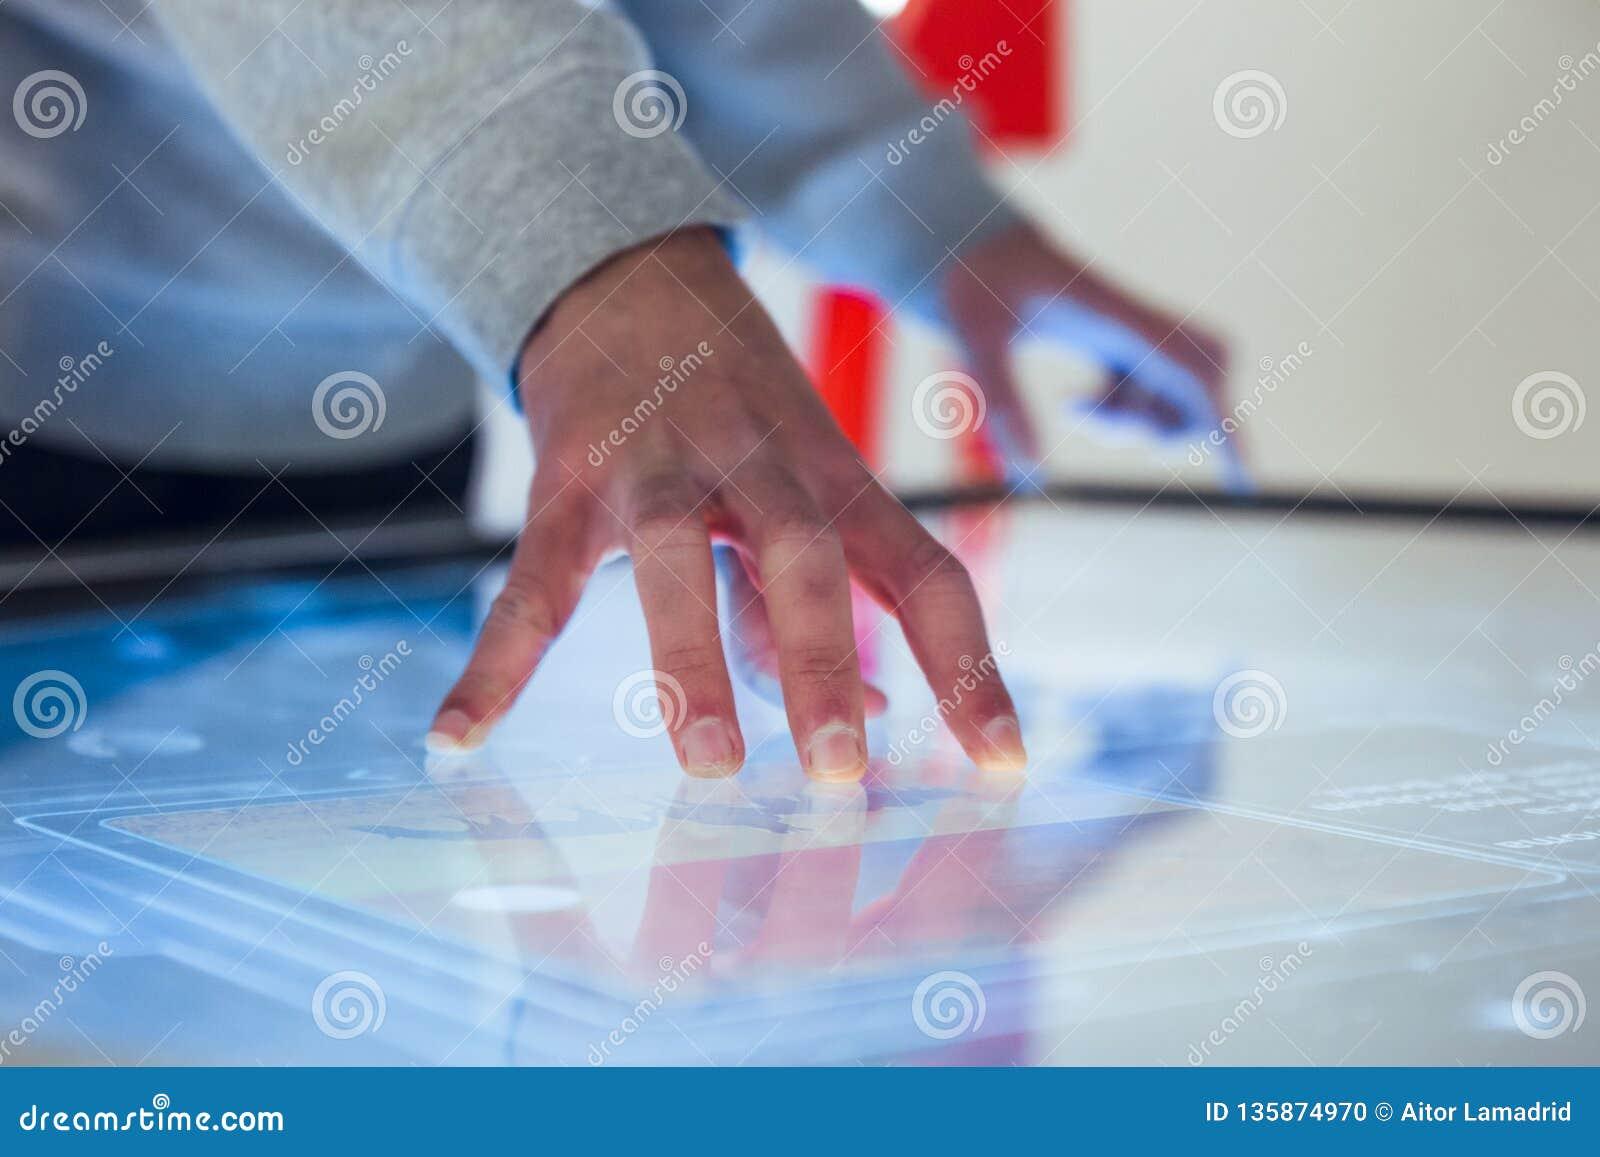 Hand die met groot touch screen in wisselwerking staan